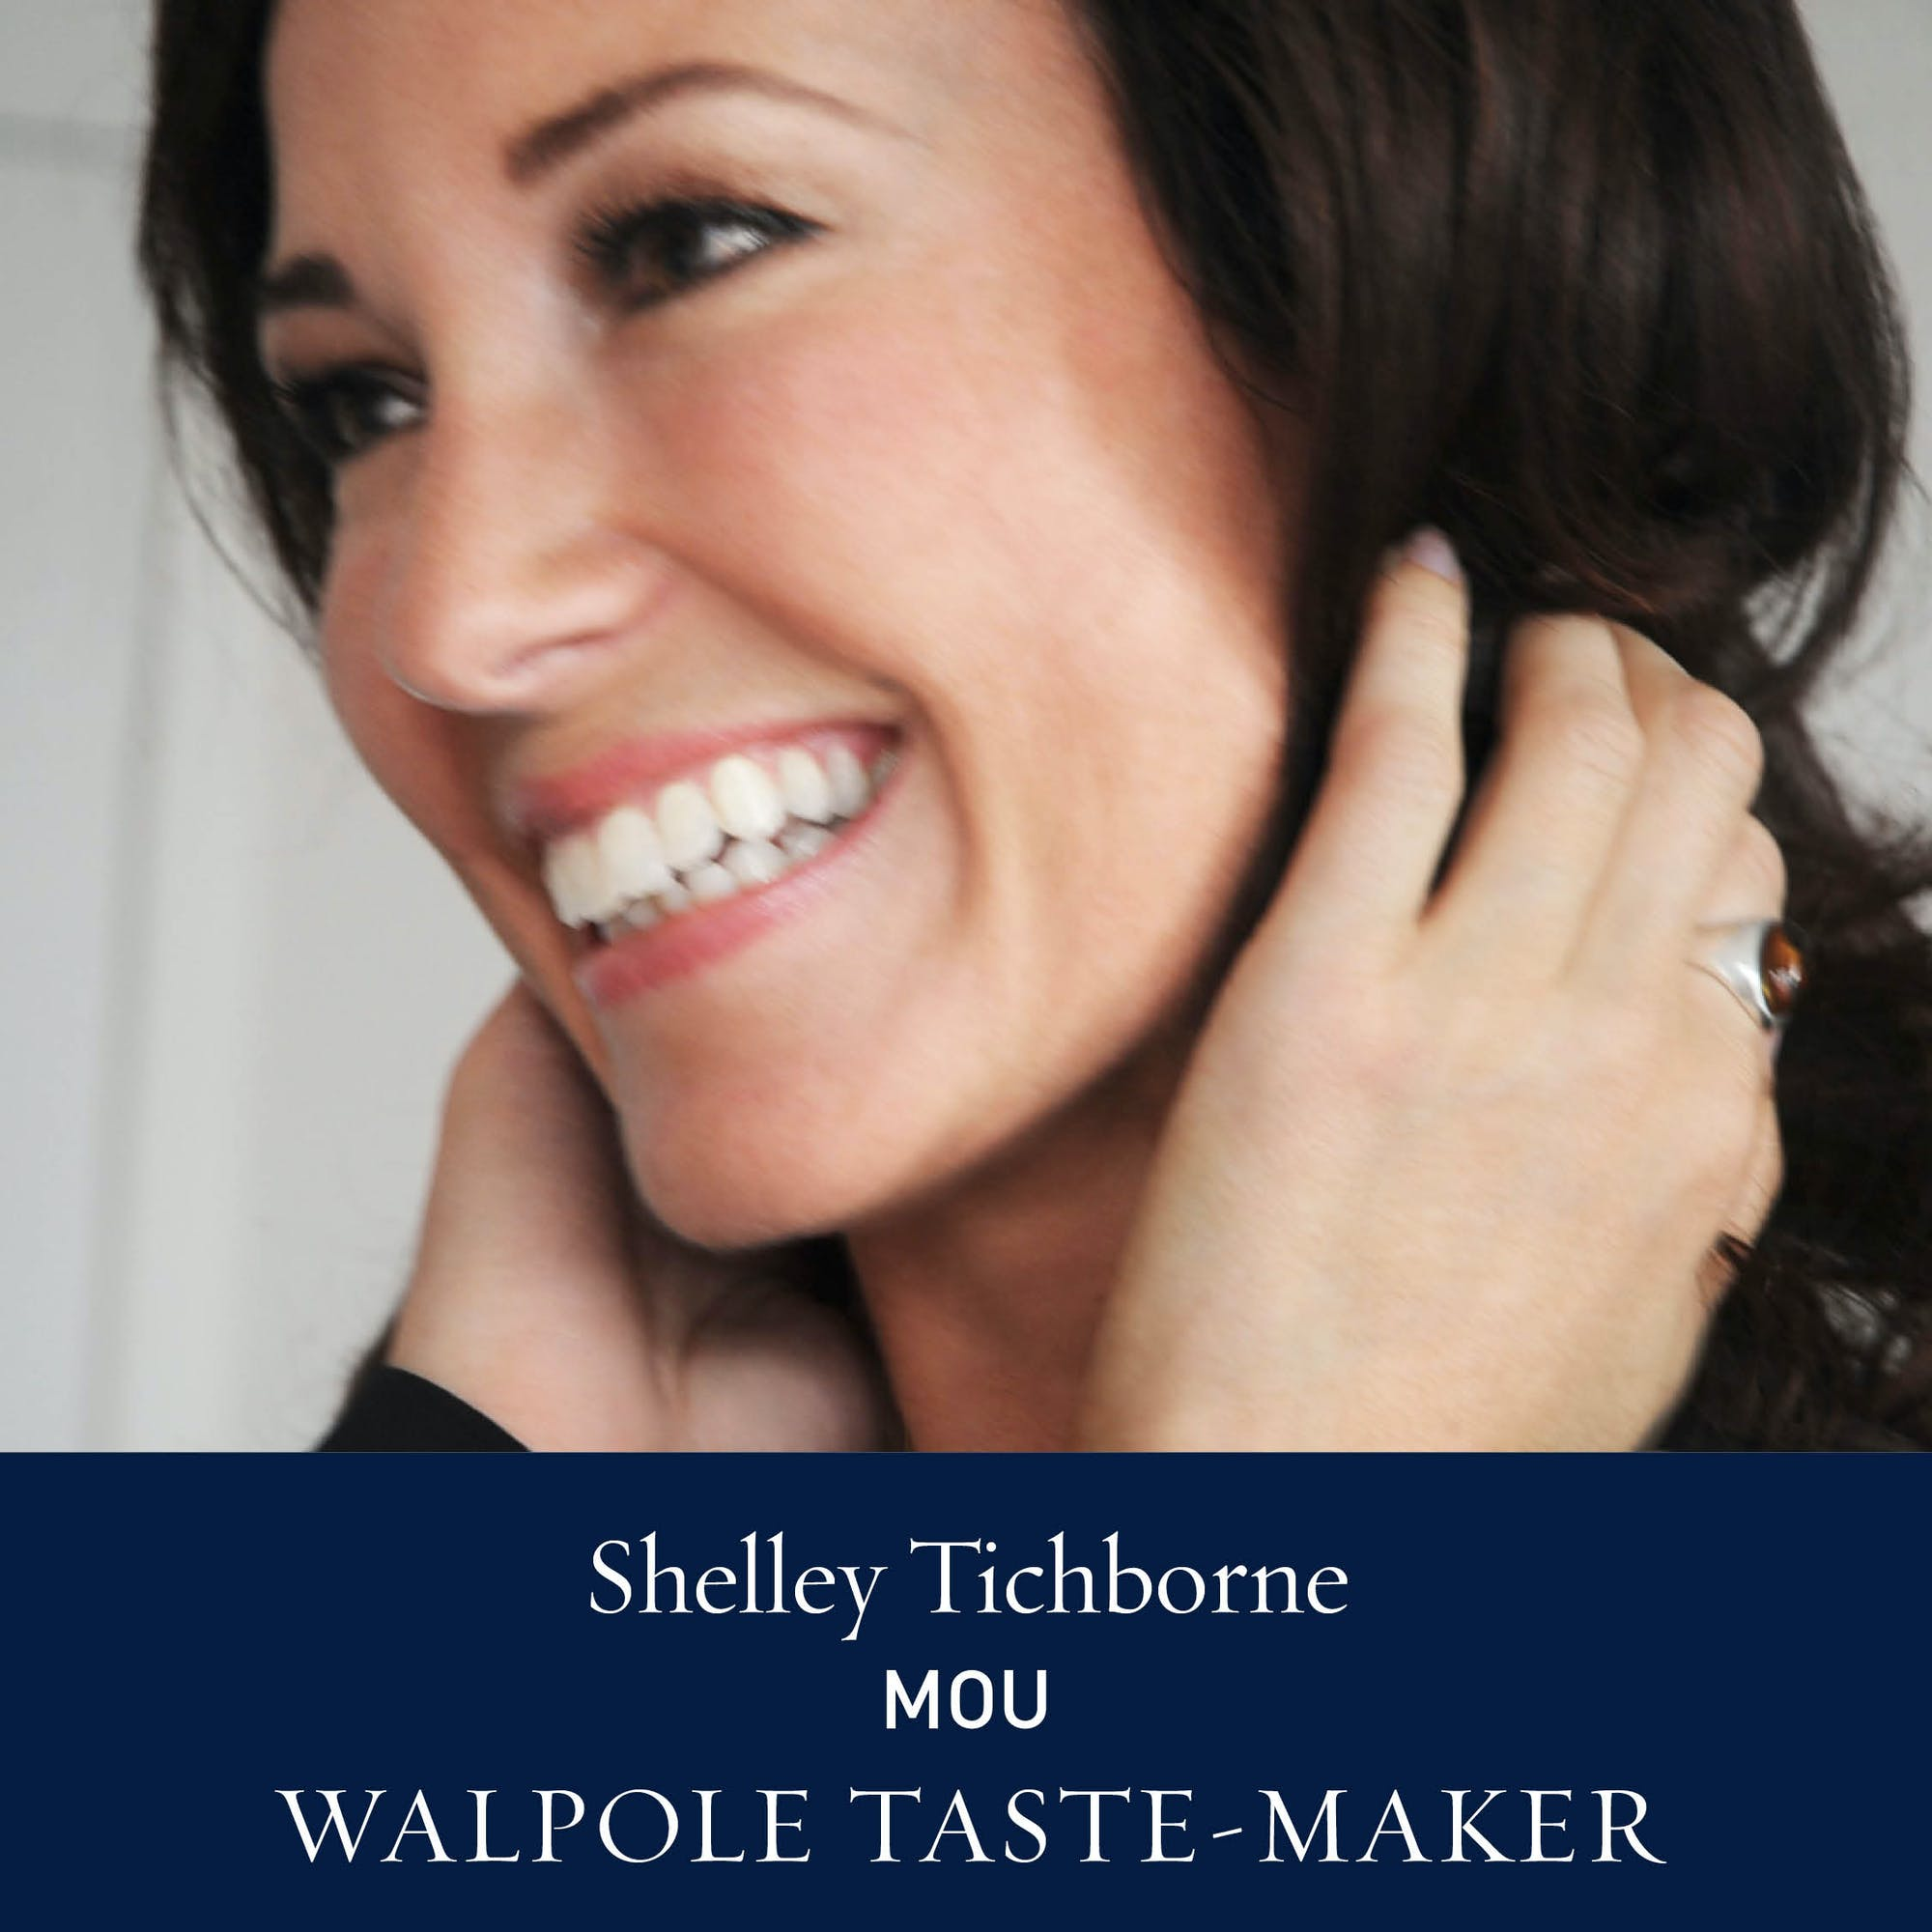 The Walpole Power List 2020  The Taste-Makers: Shelley Tichborne, Mou